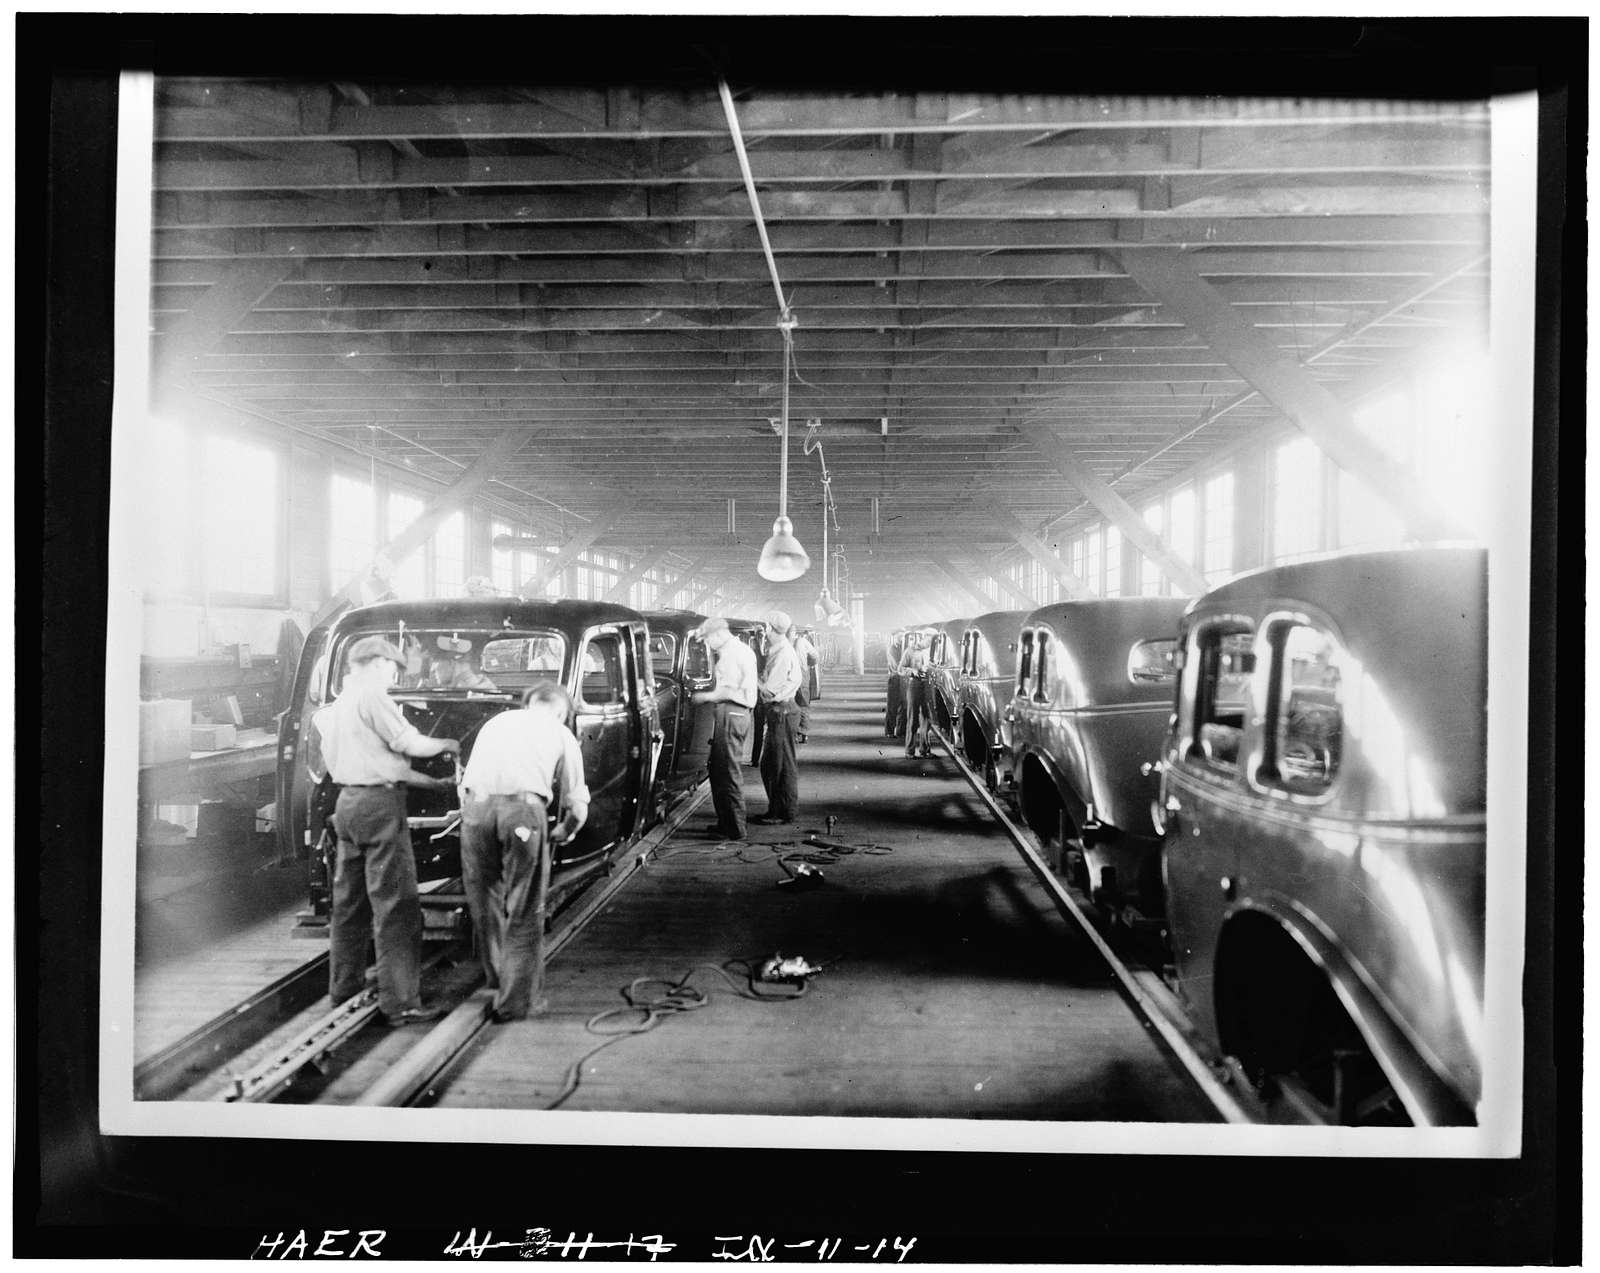 Lexington Motor Company, Eighteenth Street & Columbia Avenue, Connersville, Fayette County, IN